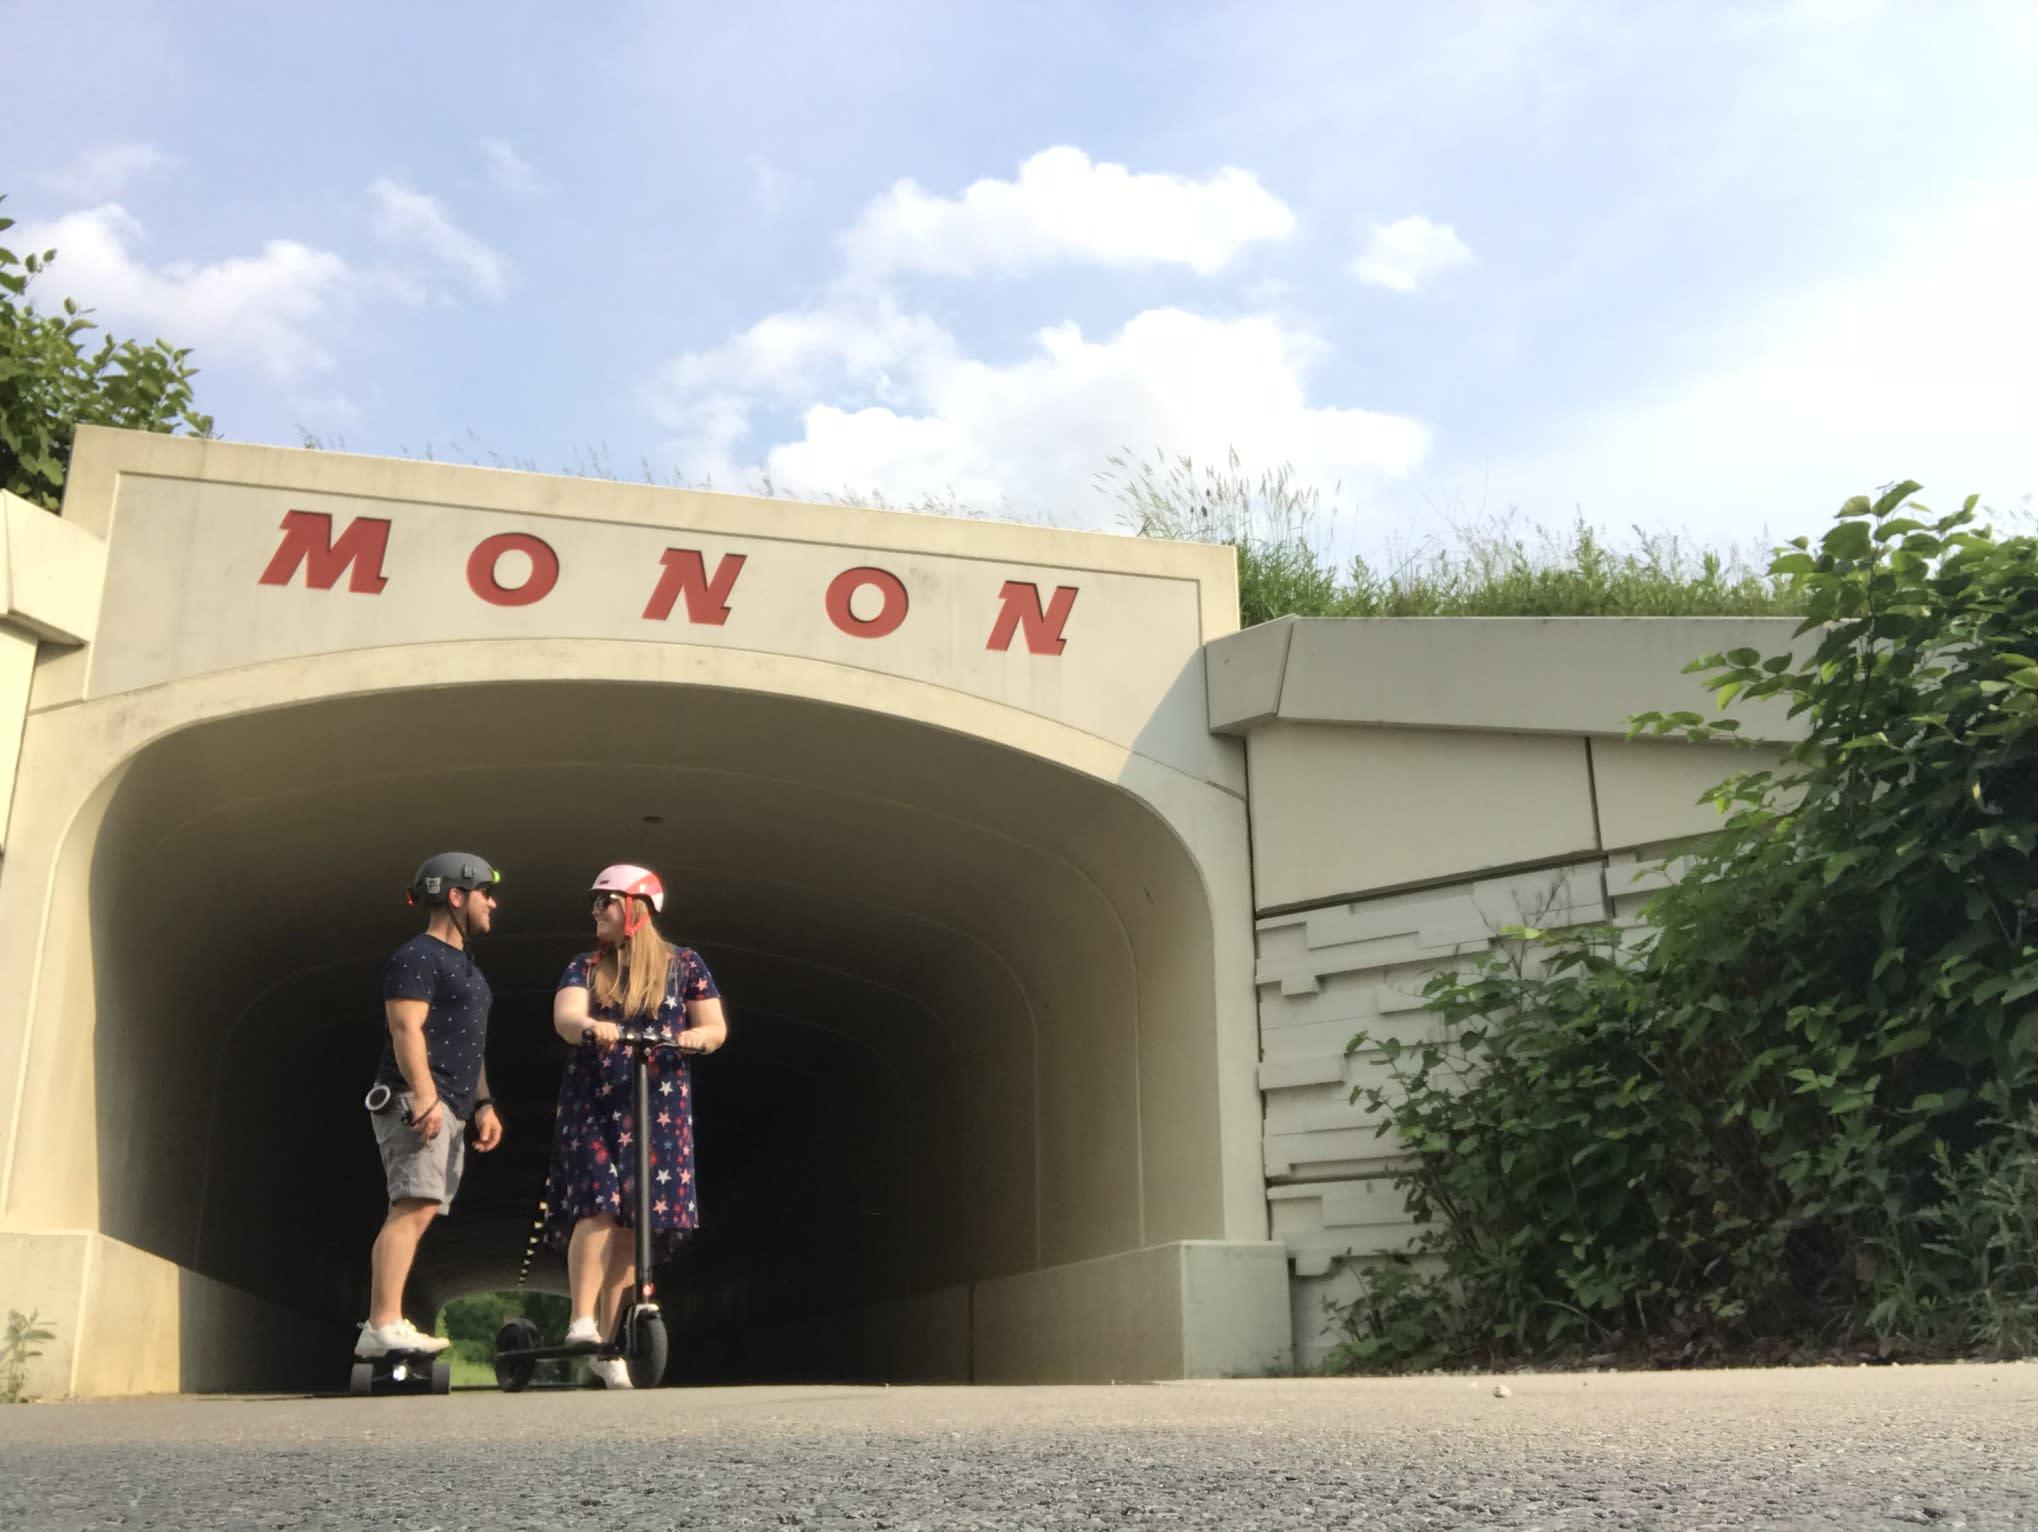 Emily Malott Monon